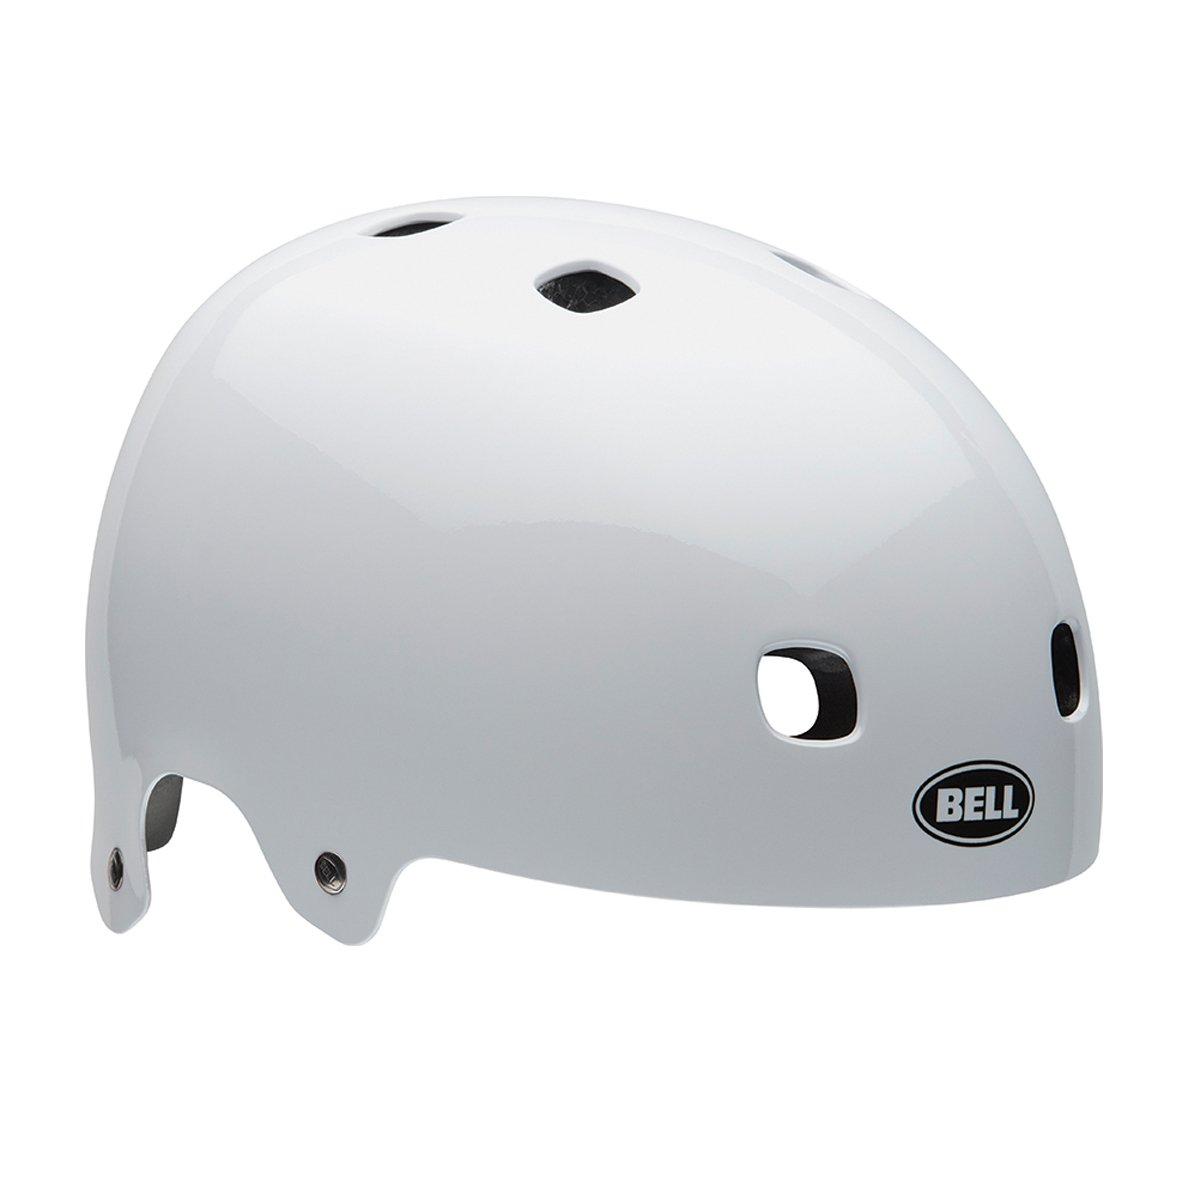 Bell Erwachsene Fahrradhelm Segment 16